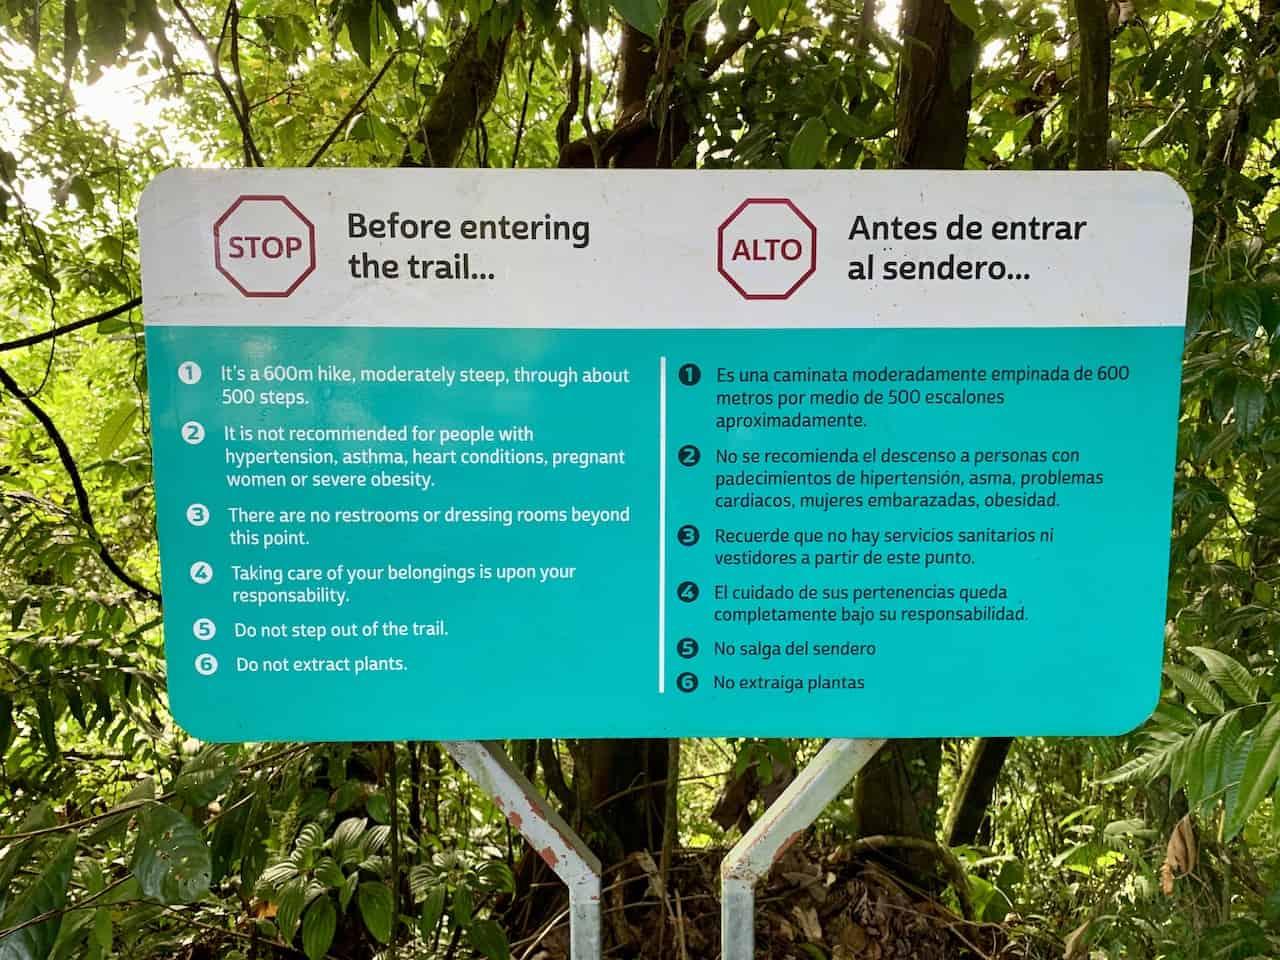 La Fortuna Waterfall Rules